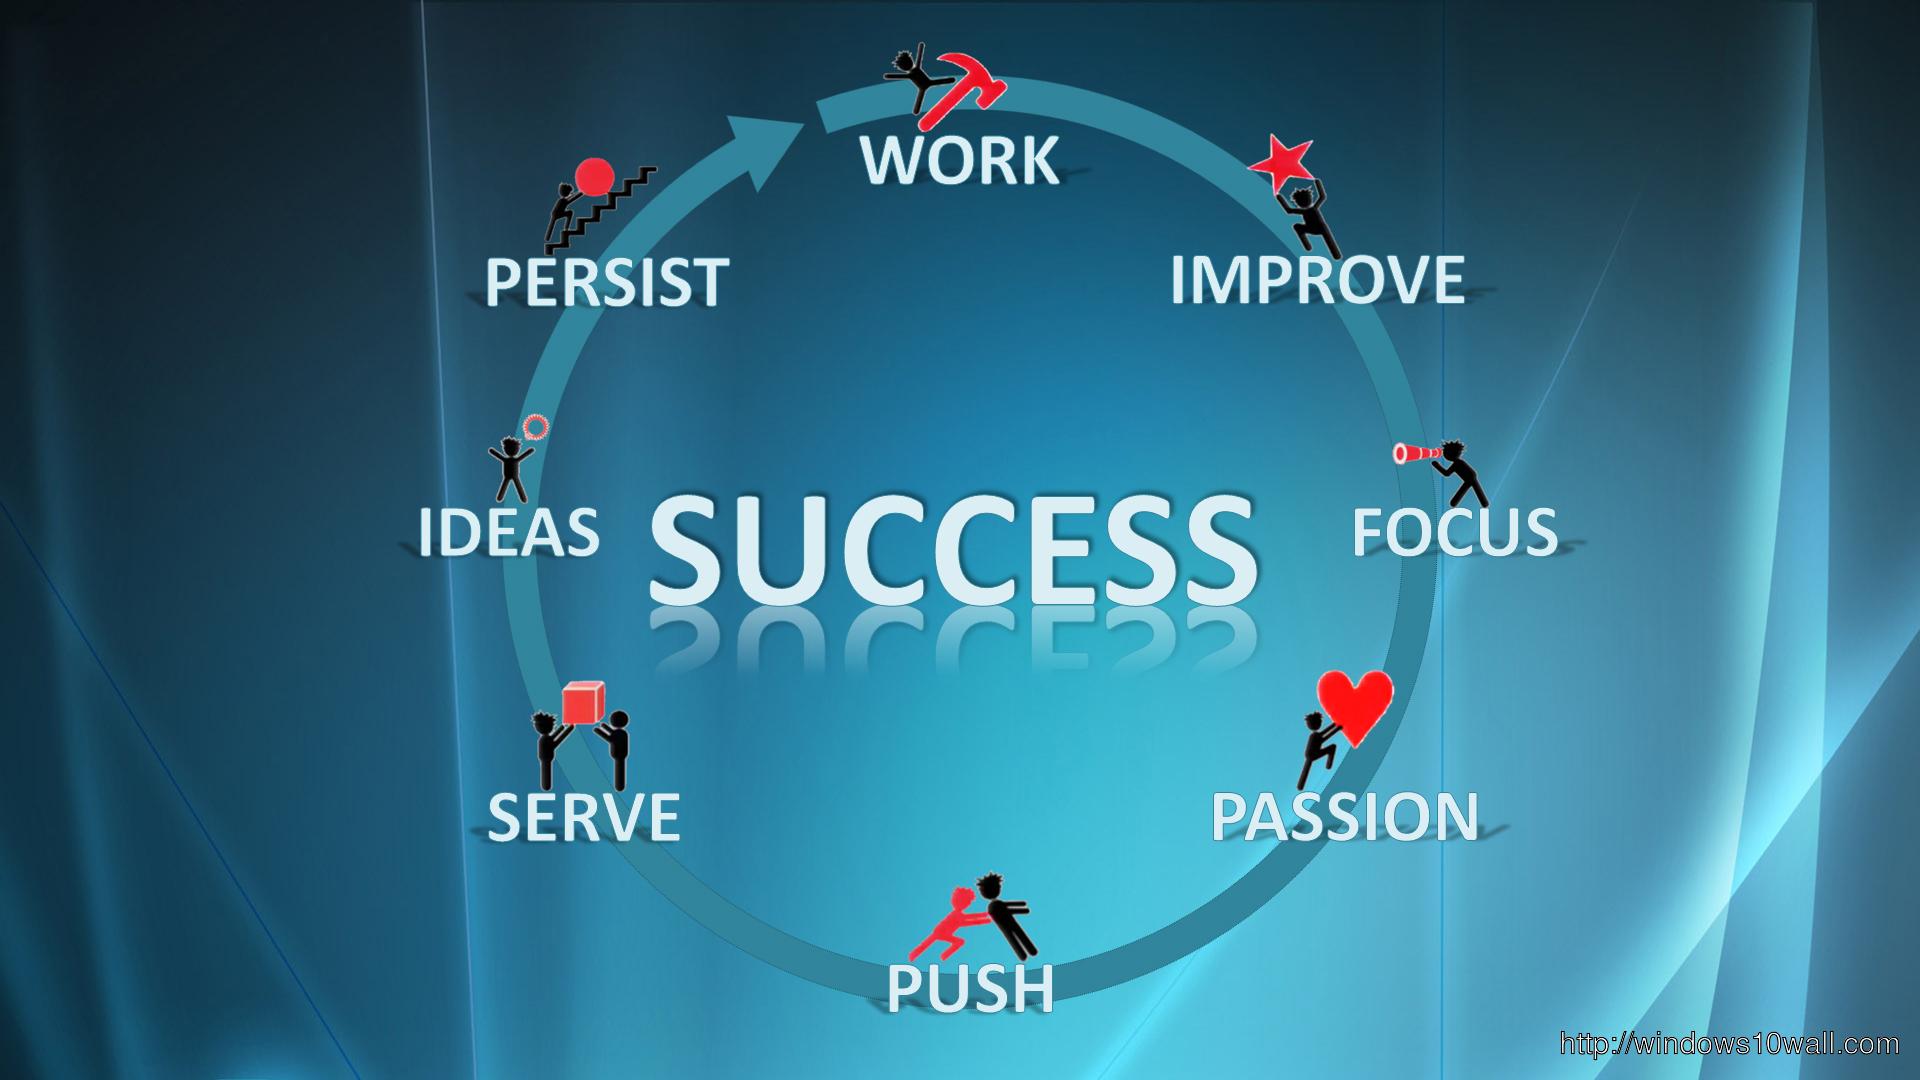 HD Wallpaper for Secrets of success in 8 words